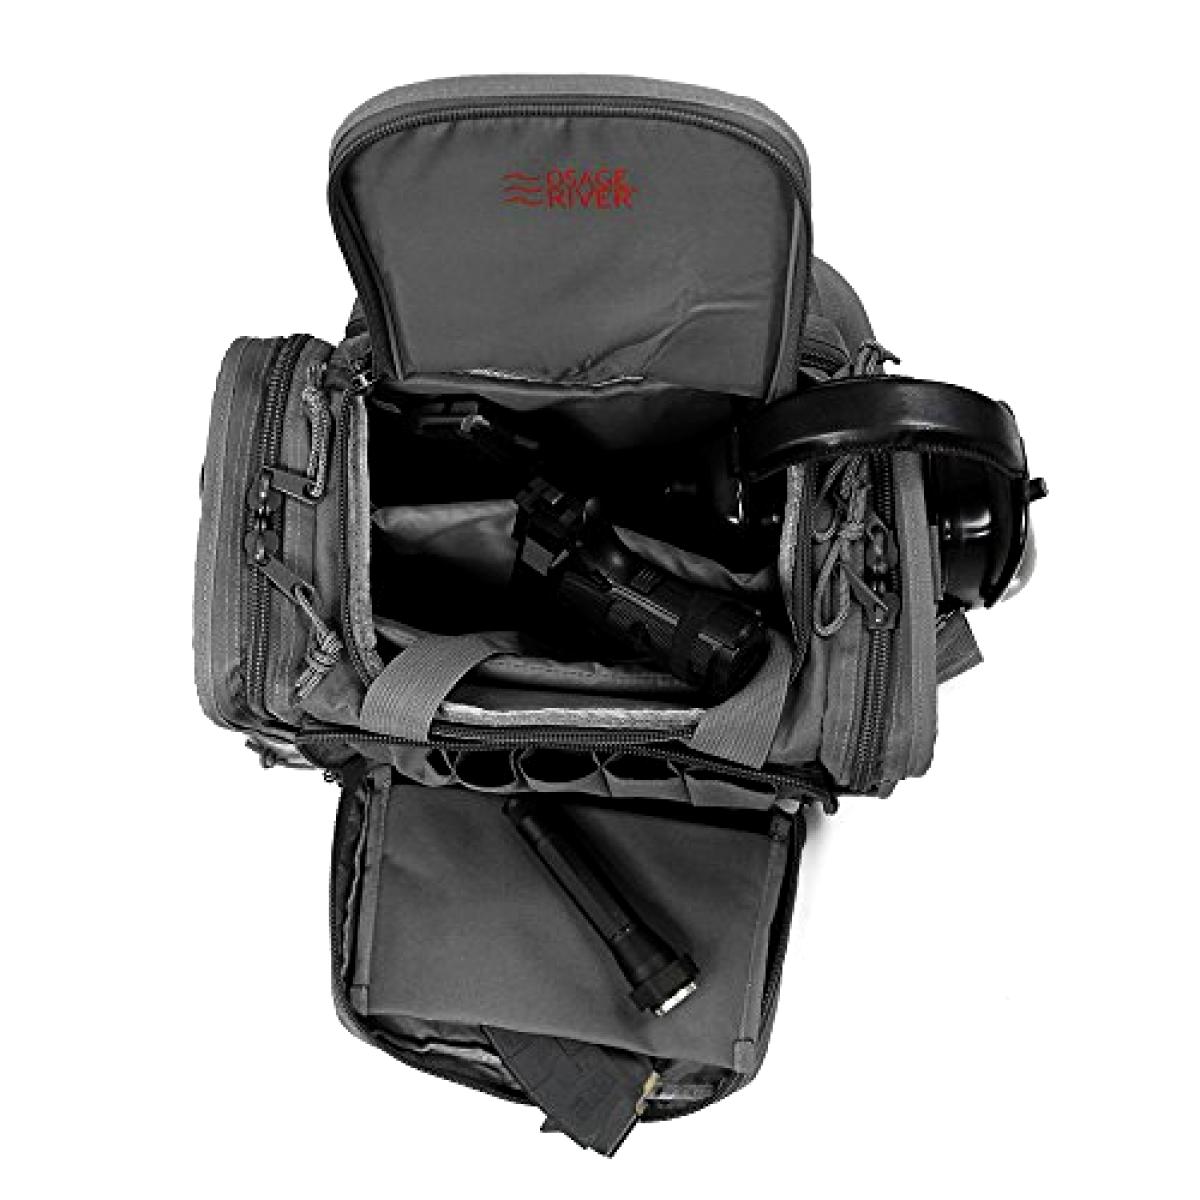 Tactical Shooting Gun Range Bag Gunmetal Grau Light Duty 13.5 x 10.5 x 7.5 Inch